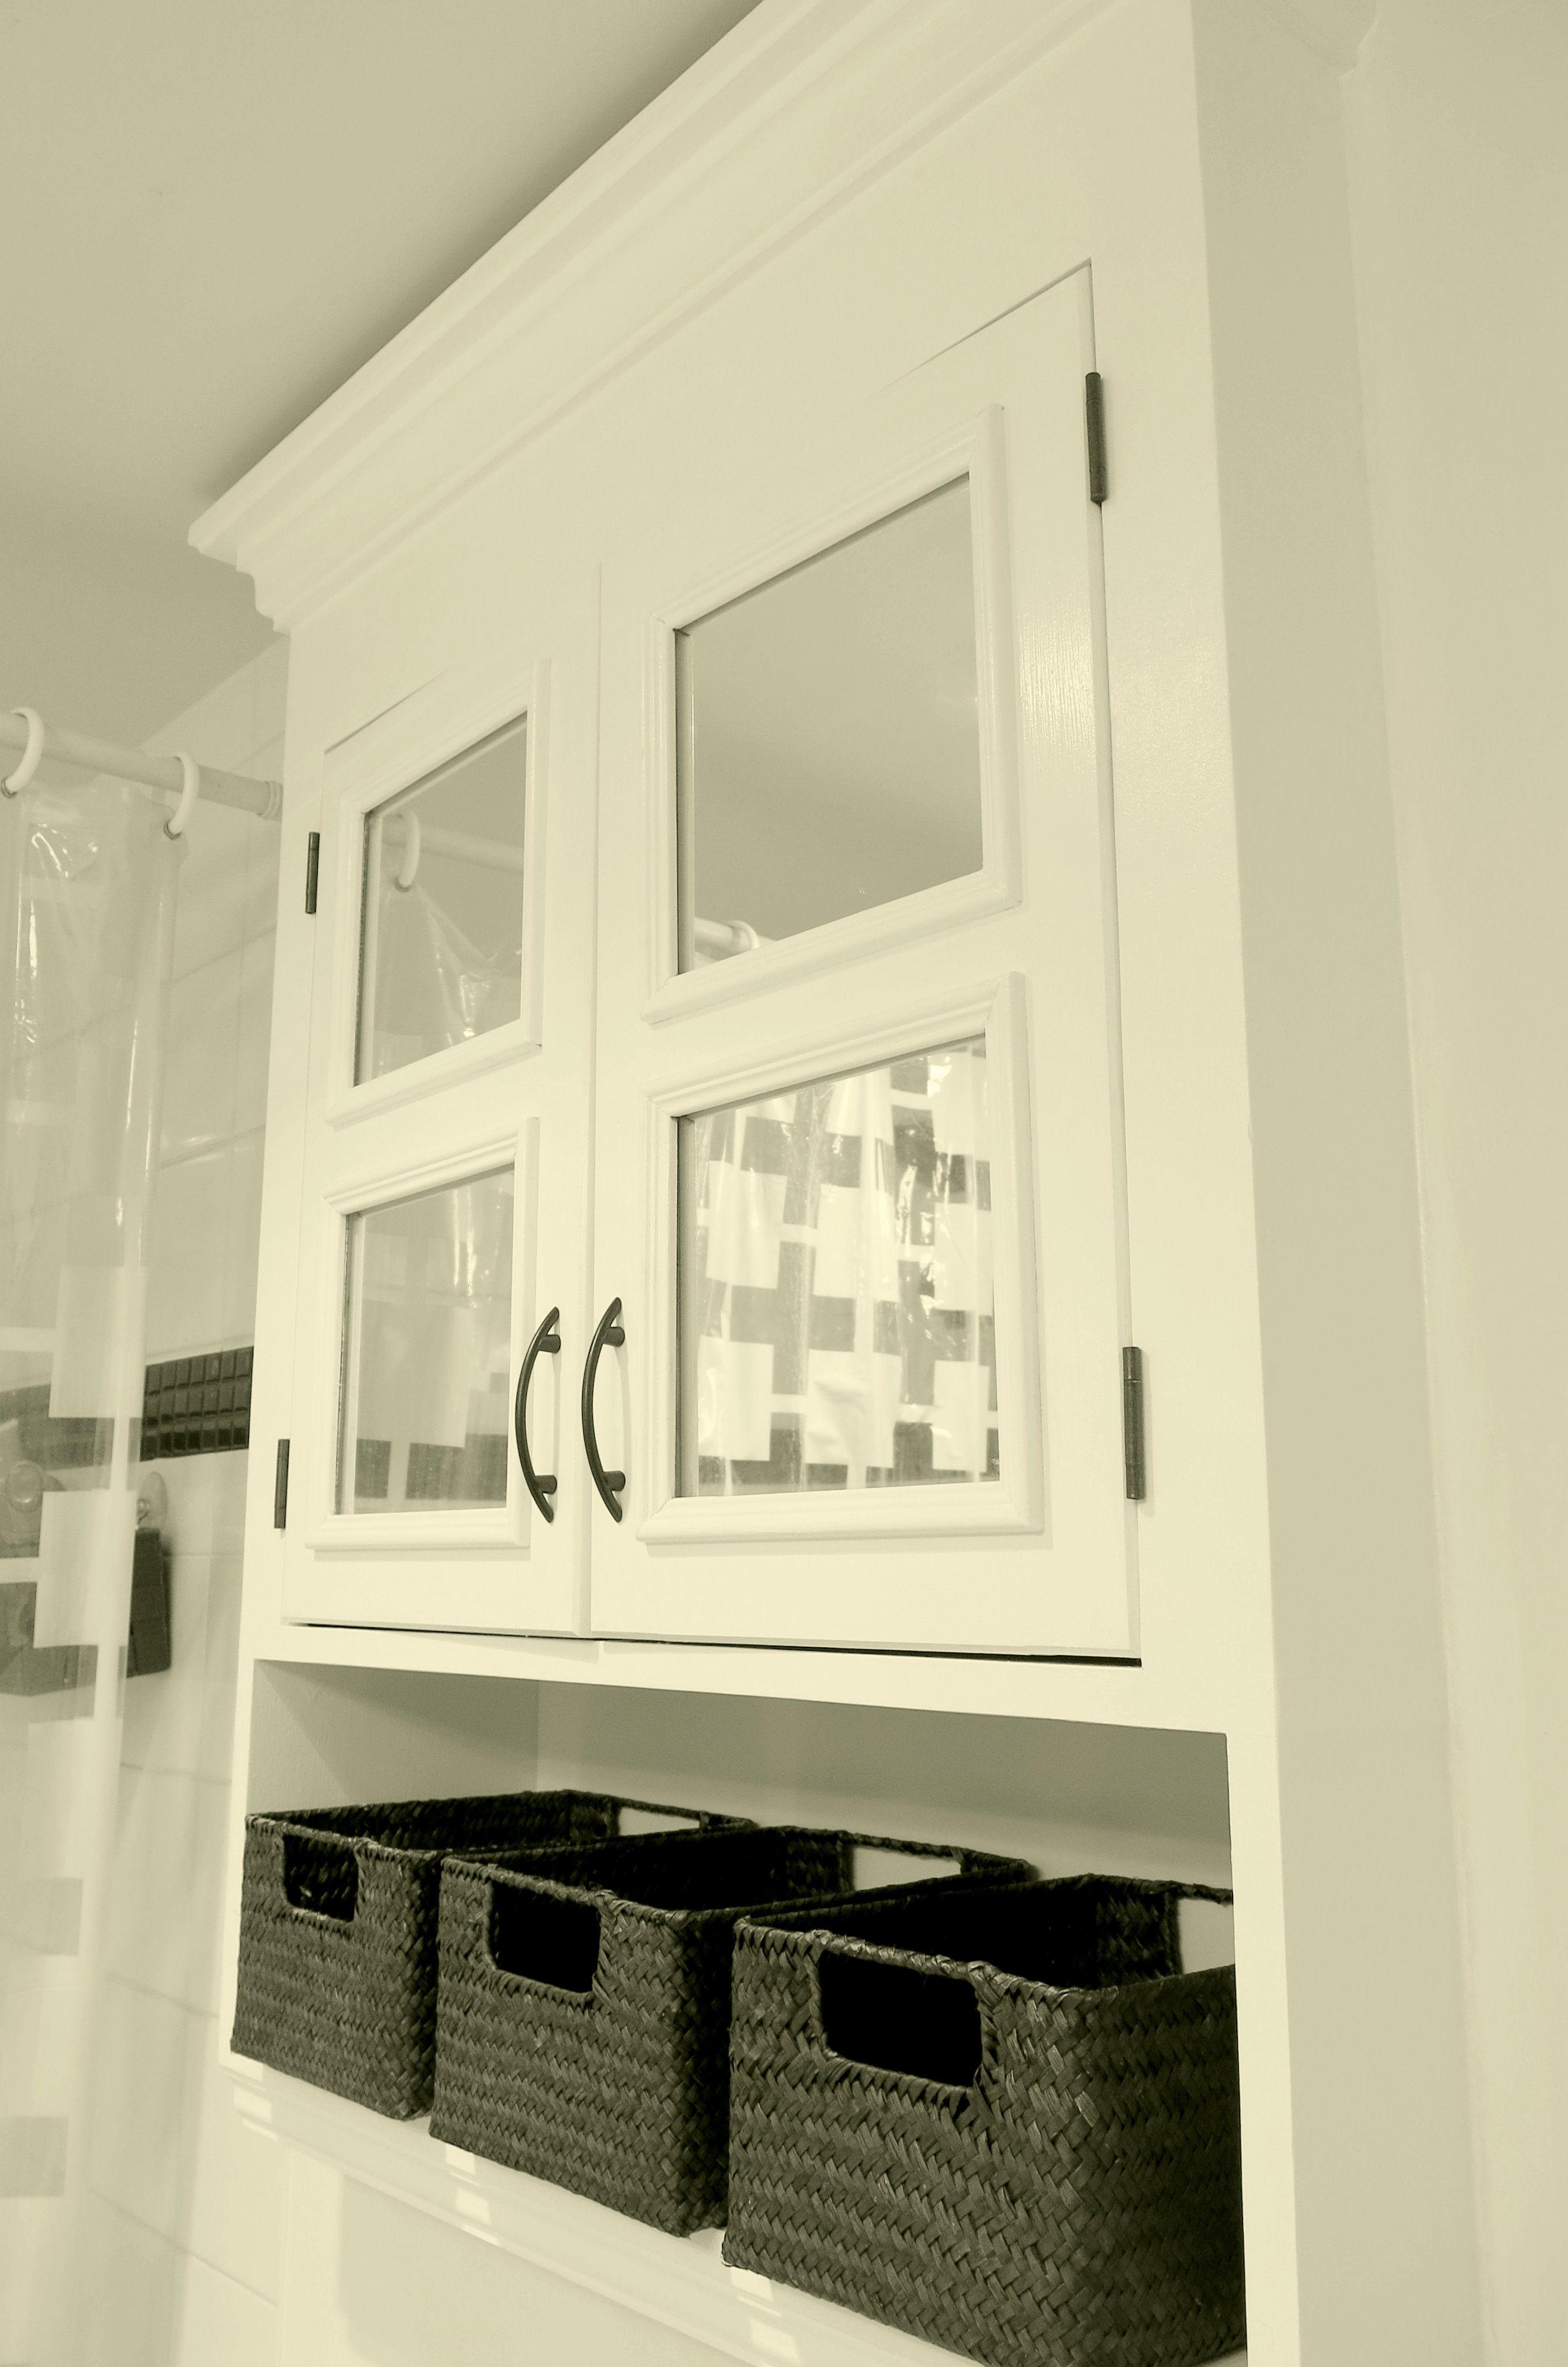 bathroom medicine cabinet/storage cupboard with basket organizers, mirror panels, crown molding, white wood